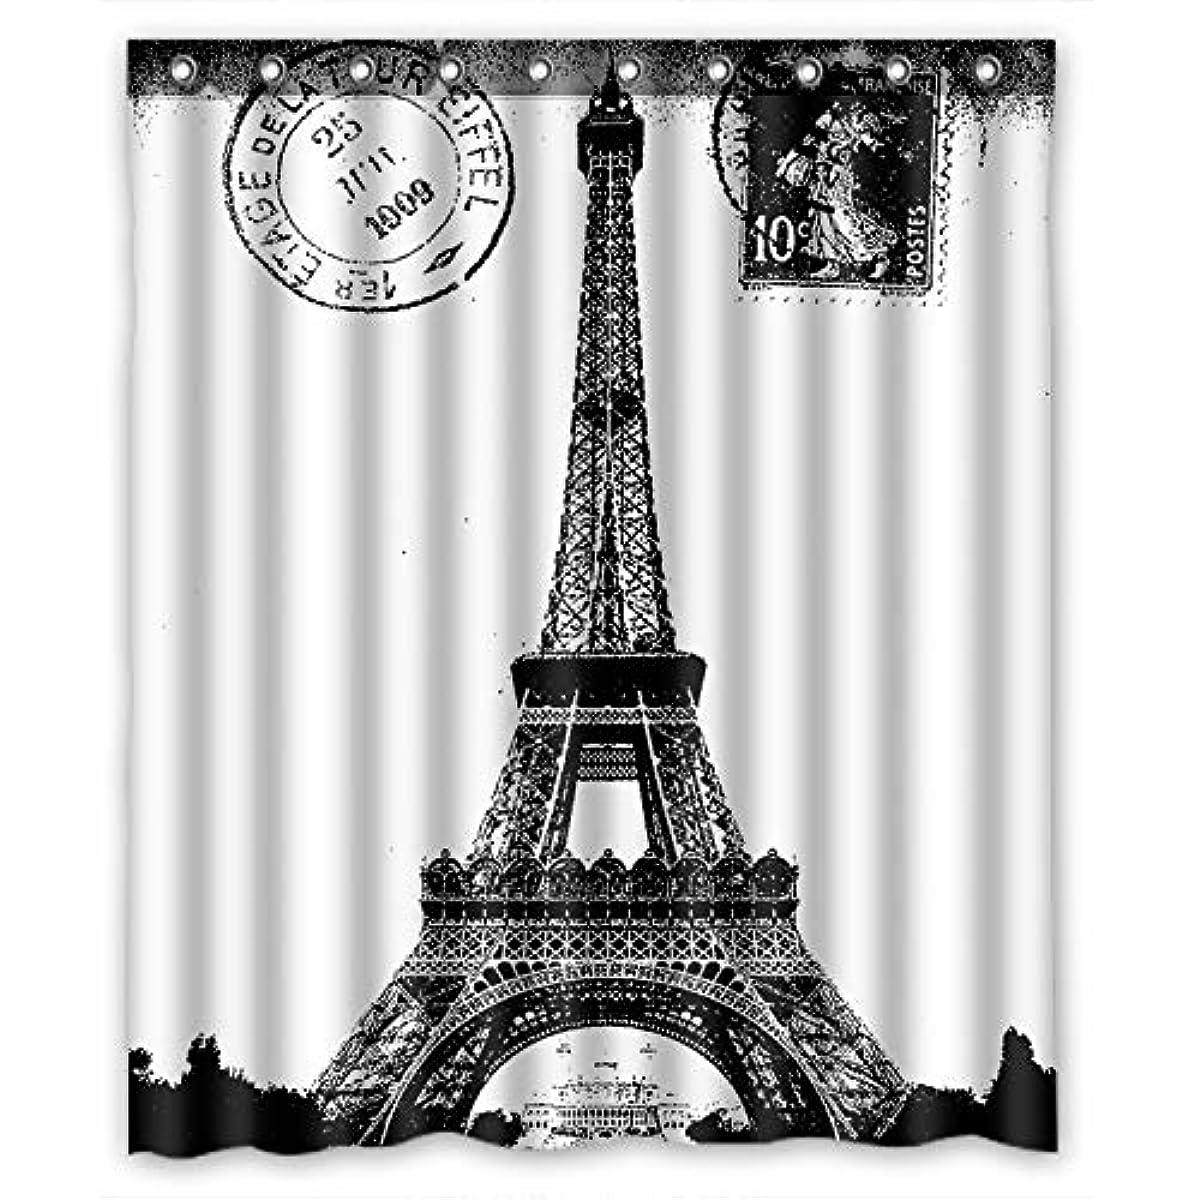 Paris Eiffel Tower Shower Curtain Fabric Waterproof 60 x ...